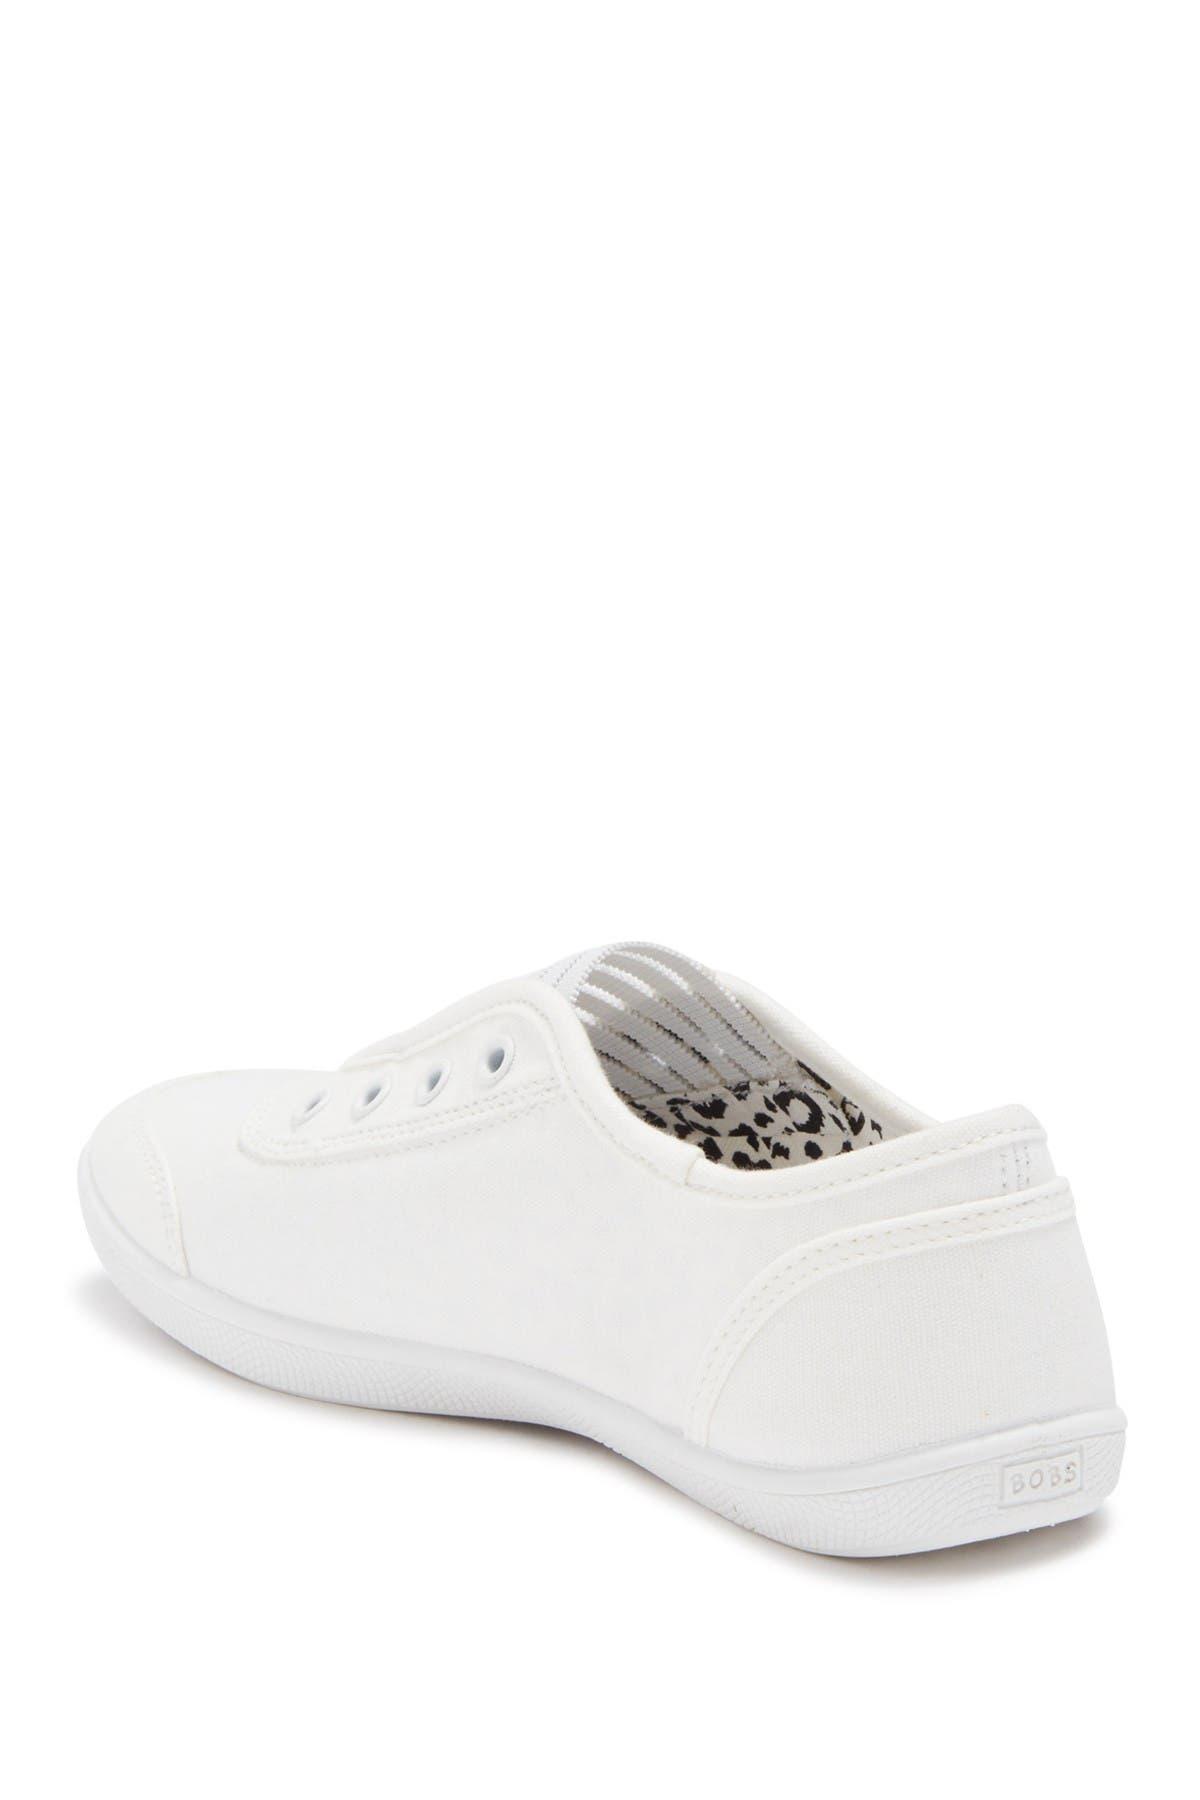 Image of Skechers Bobs B Cute Slip-On Sneaker